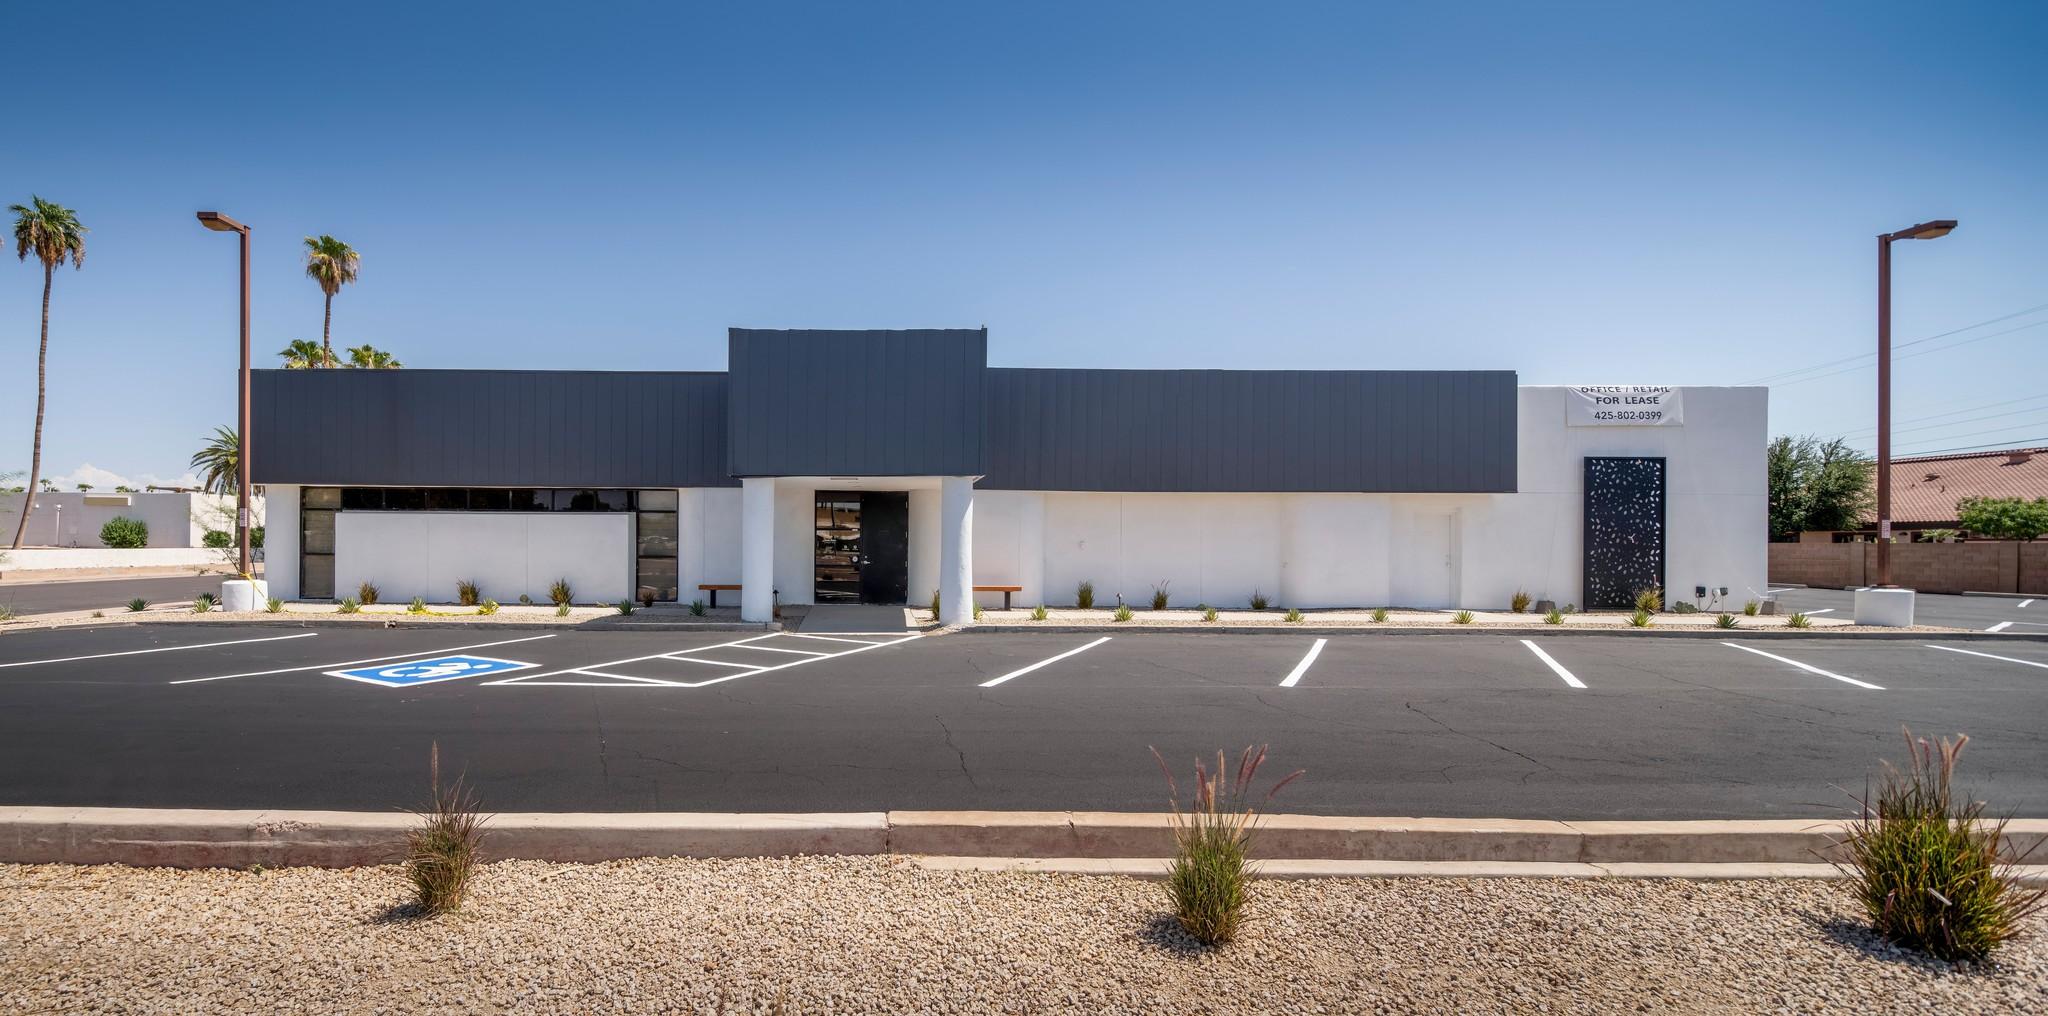 455 N Mesa Dr, Mesa AZ 85201 Medical Office Space